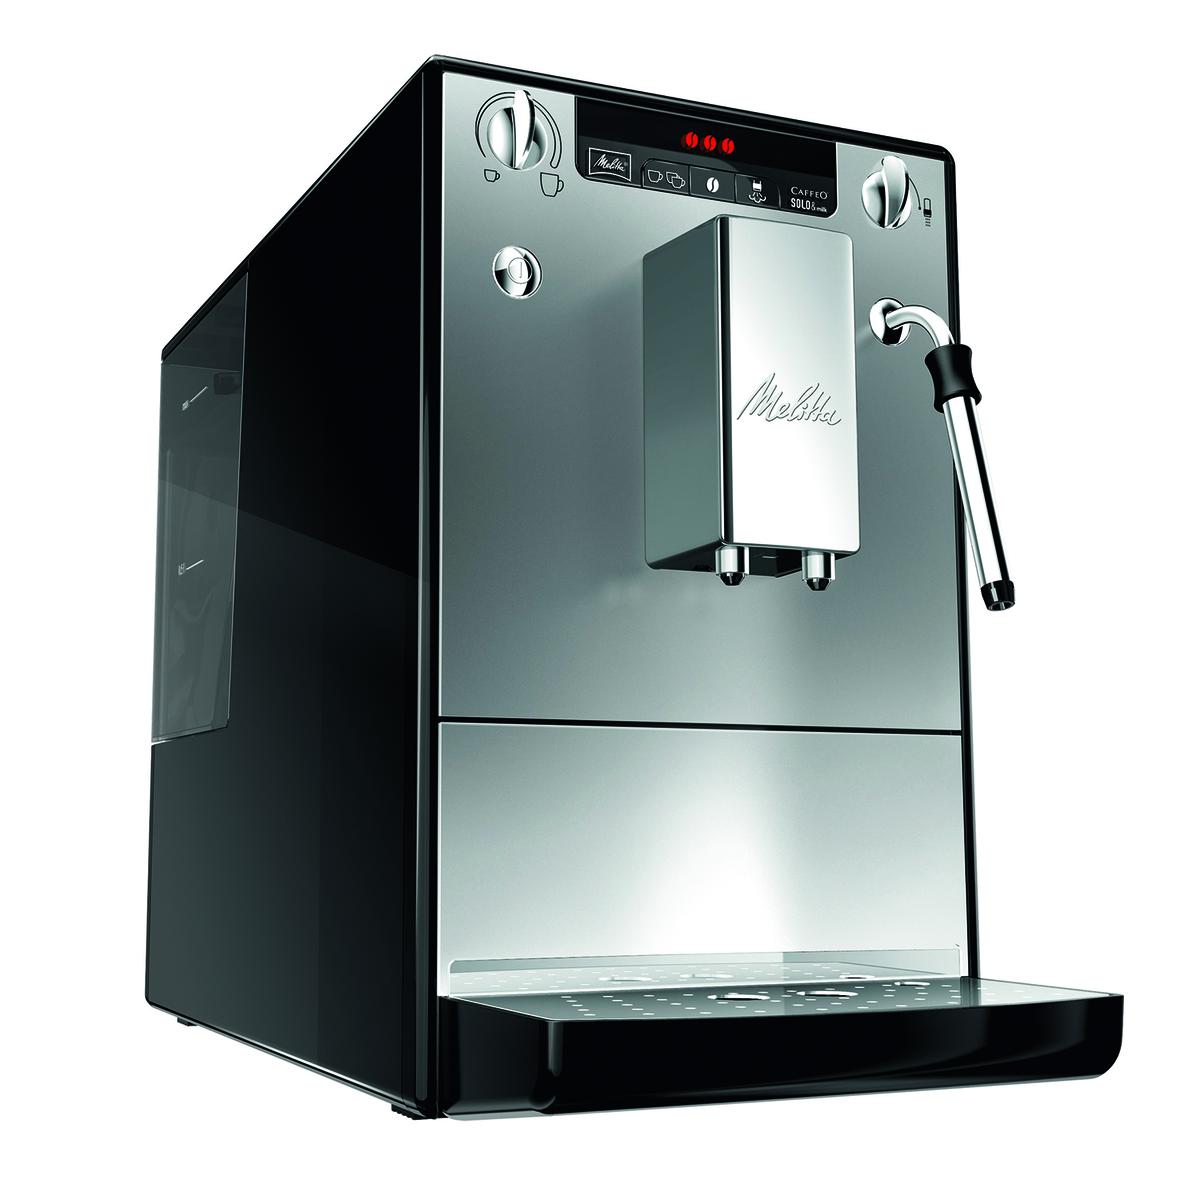 melitta kaffeevollautomat caffeo solo milk jetzt im kodi onlineshop kaufen alles f r den. Black Bedroom Furniture Sets. Home Design Ideas